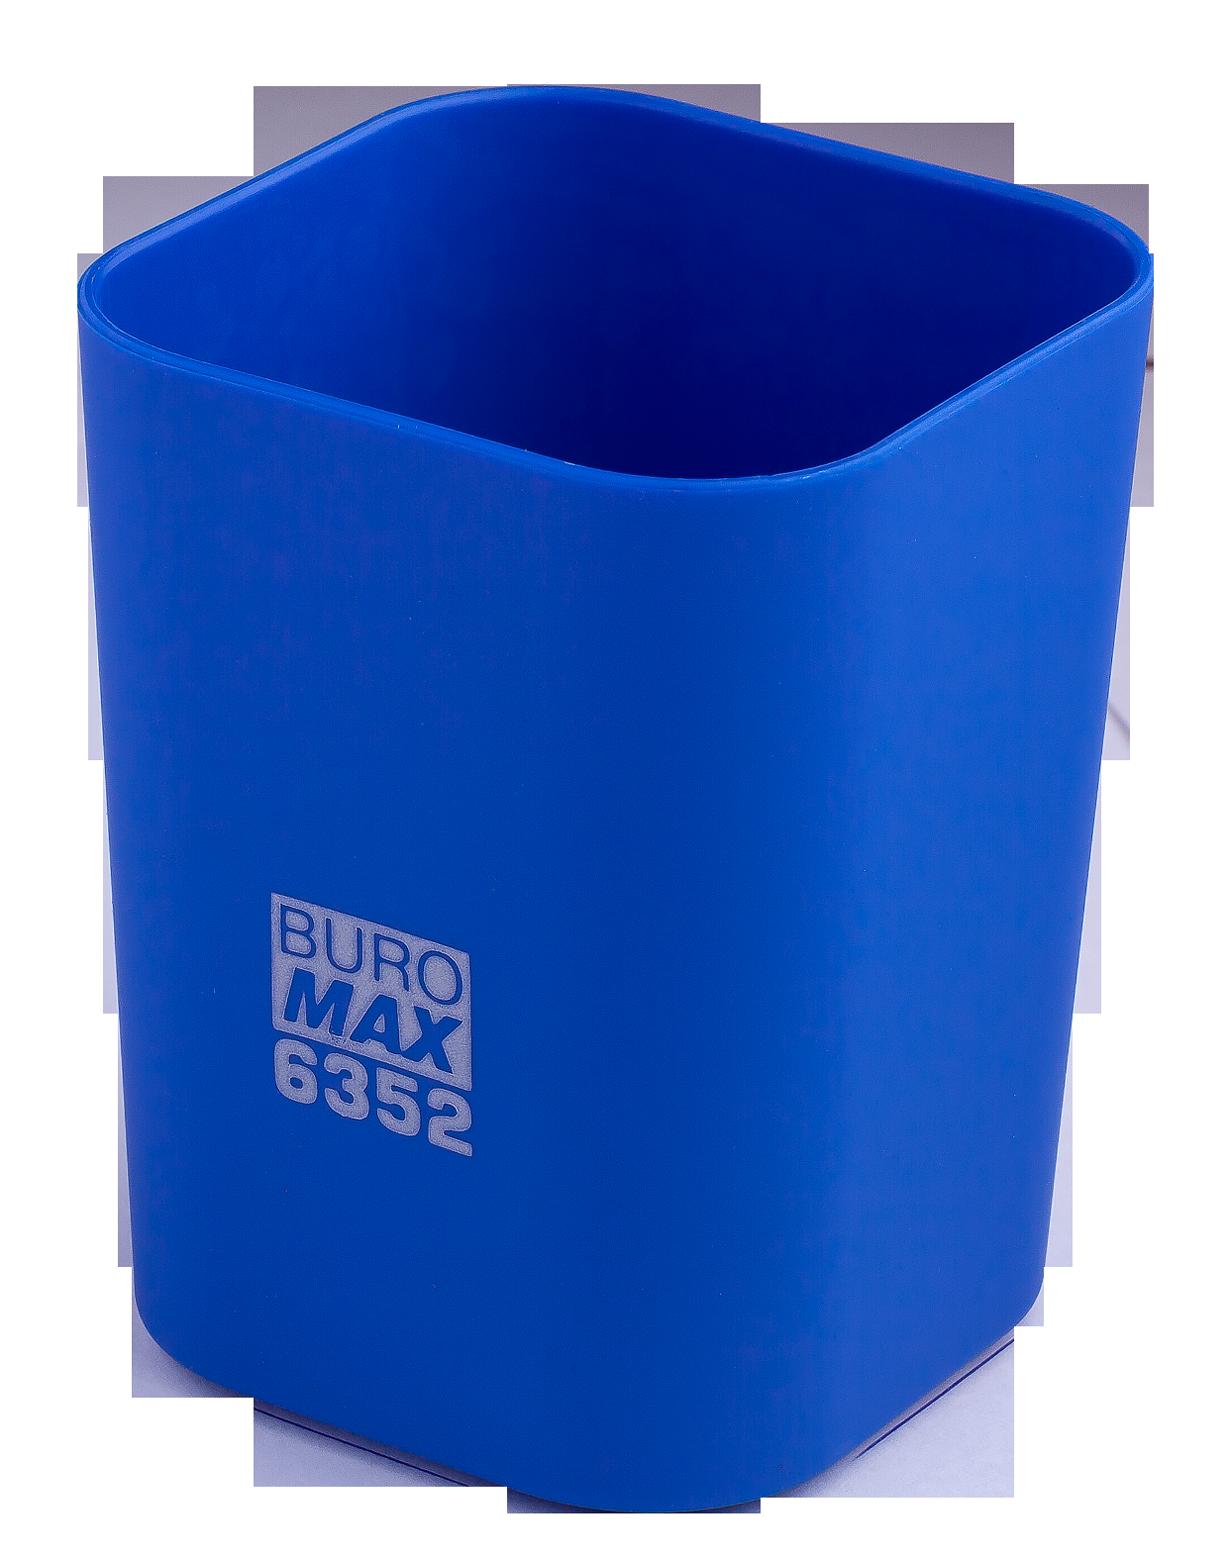 Подставка для ручекпластиковаяквадратная Buromax Ruber Touch, синяя